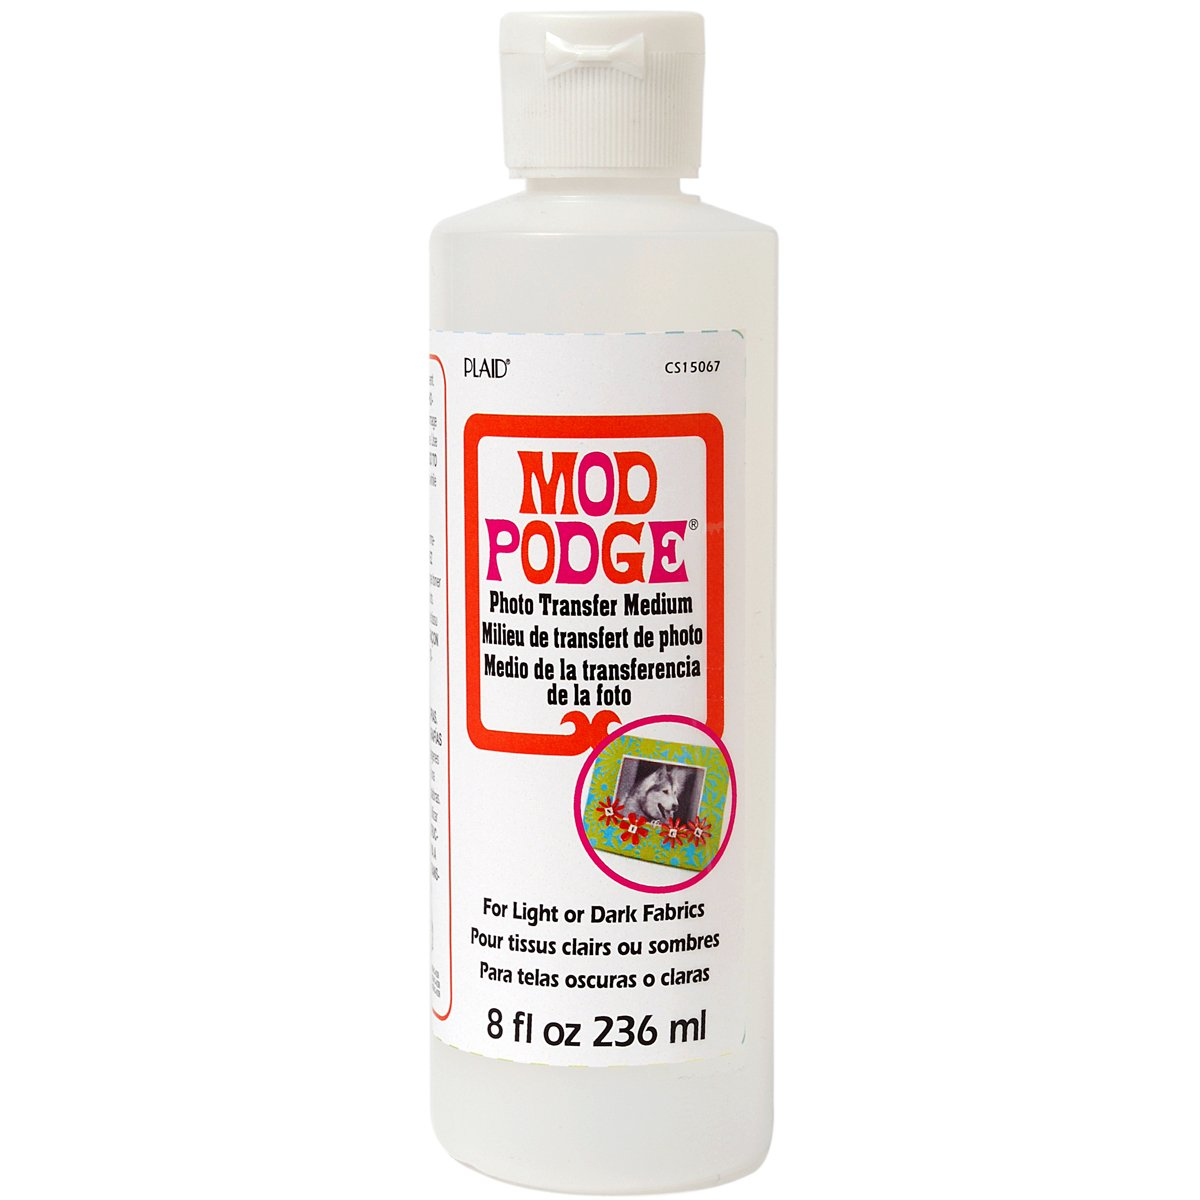 Mod Podge Darice Photo Transfer Medium (8 Oz), CS15067 by Mod Podge (Image #1)